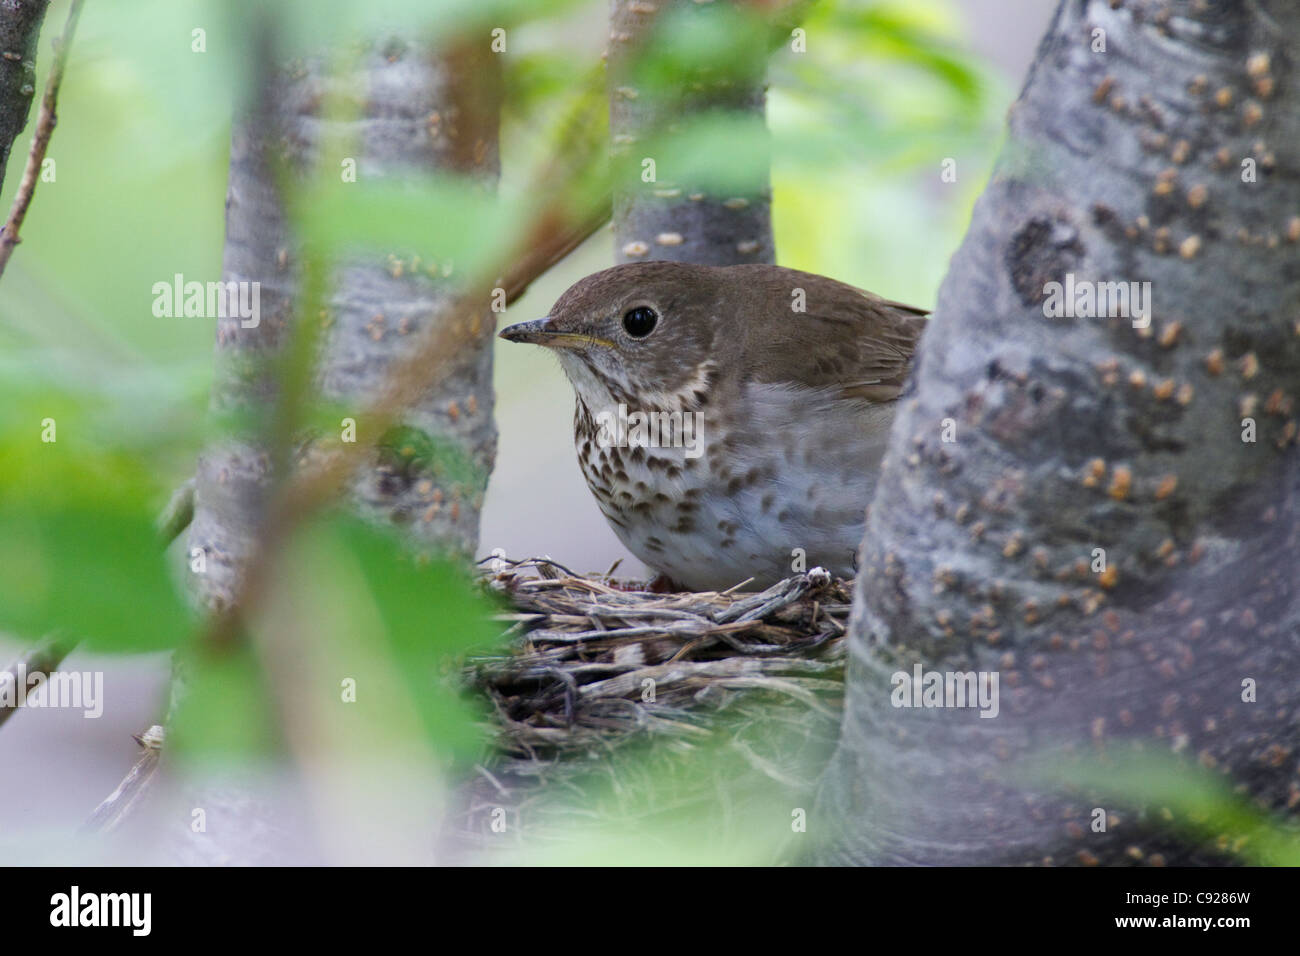 Grau-cheeked Soor auf Nest in einem Baum, Long Island, Copper River Delta, Yunan Alaska, Frühling Stockbild